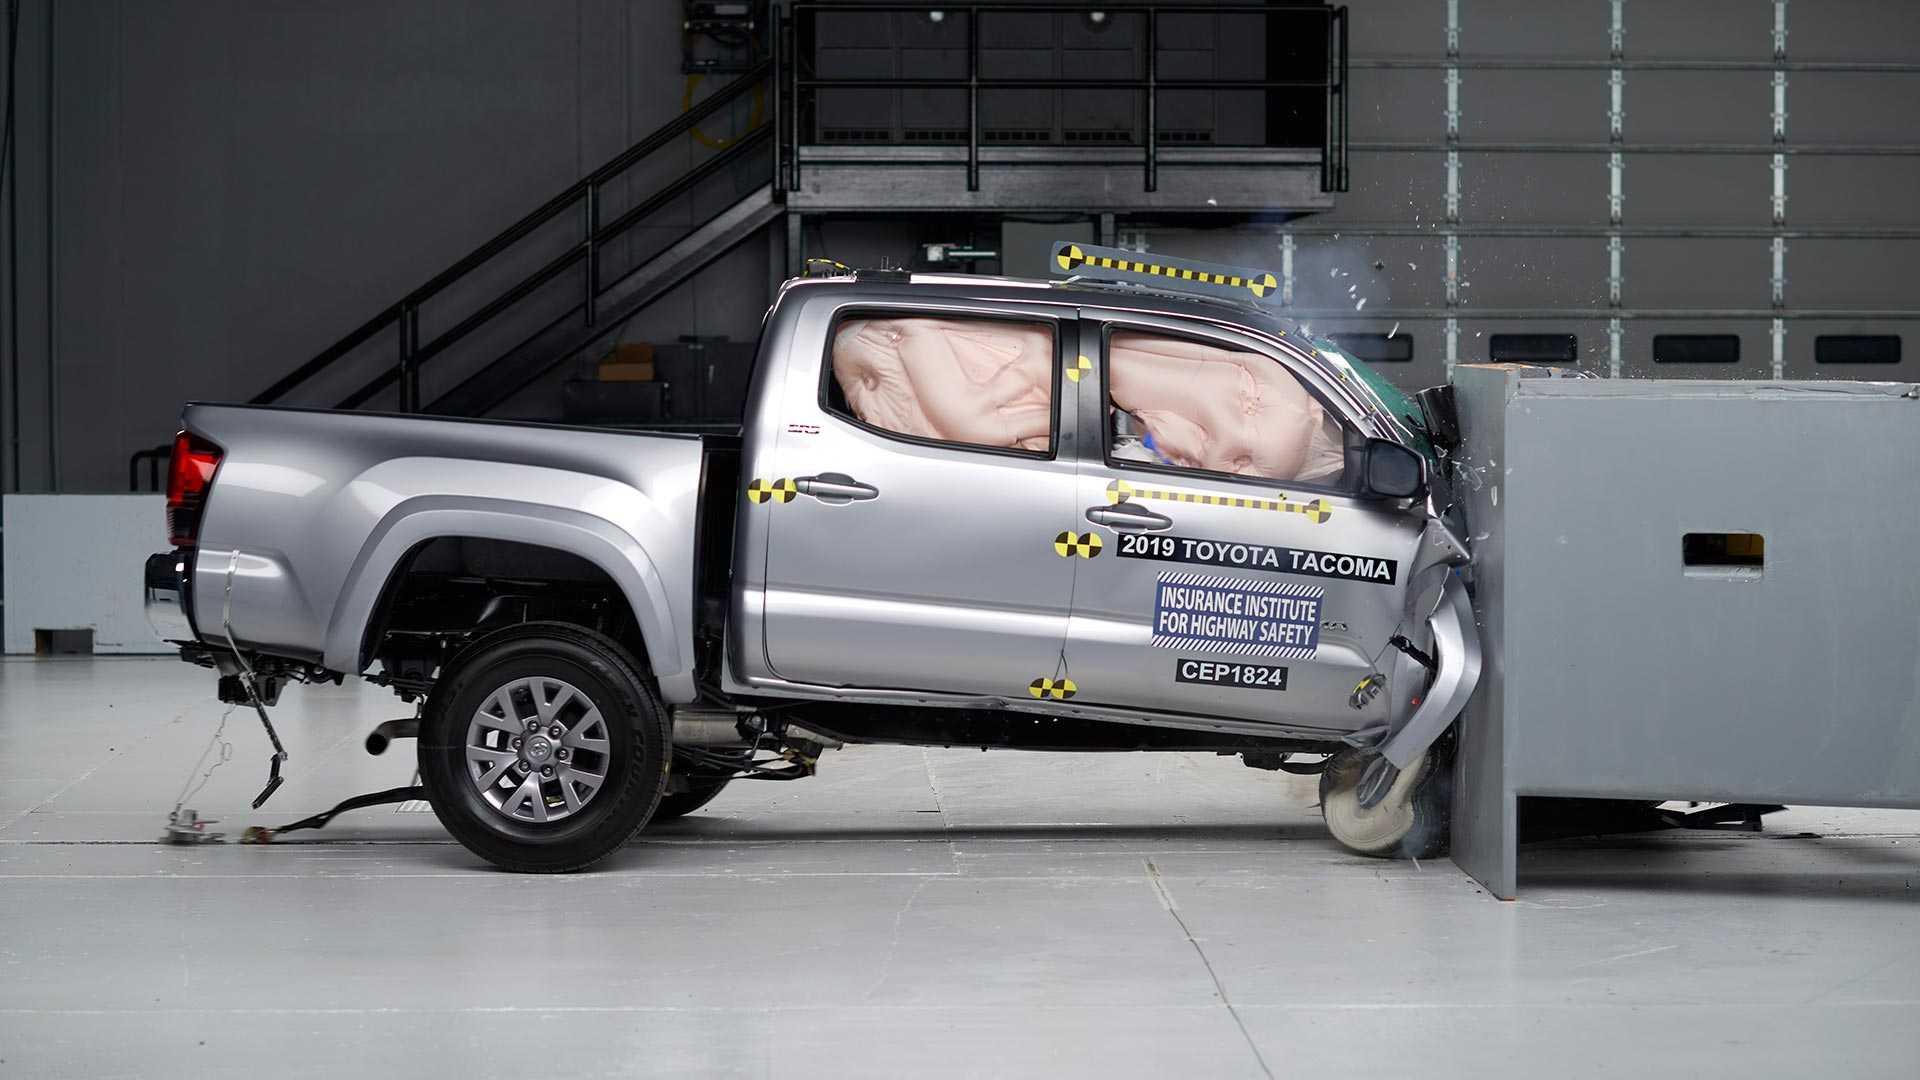 2019-toyota-tacoma-double-cab-crash-test (1)